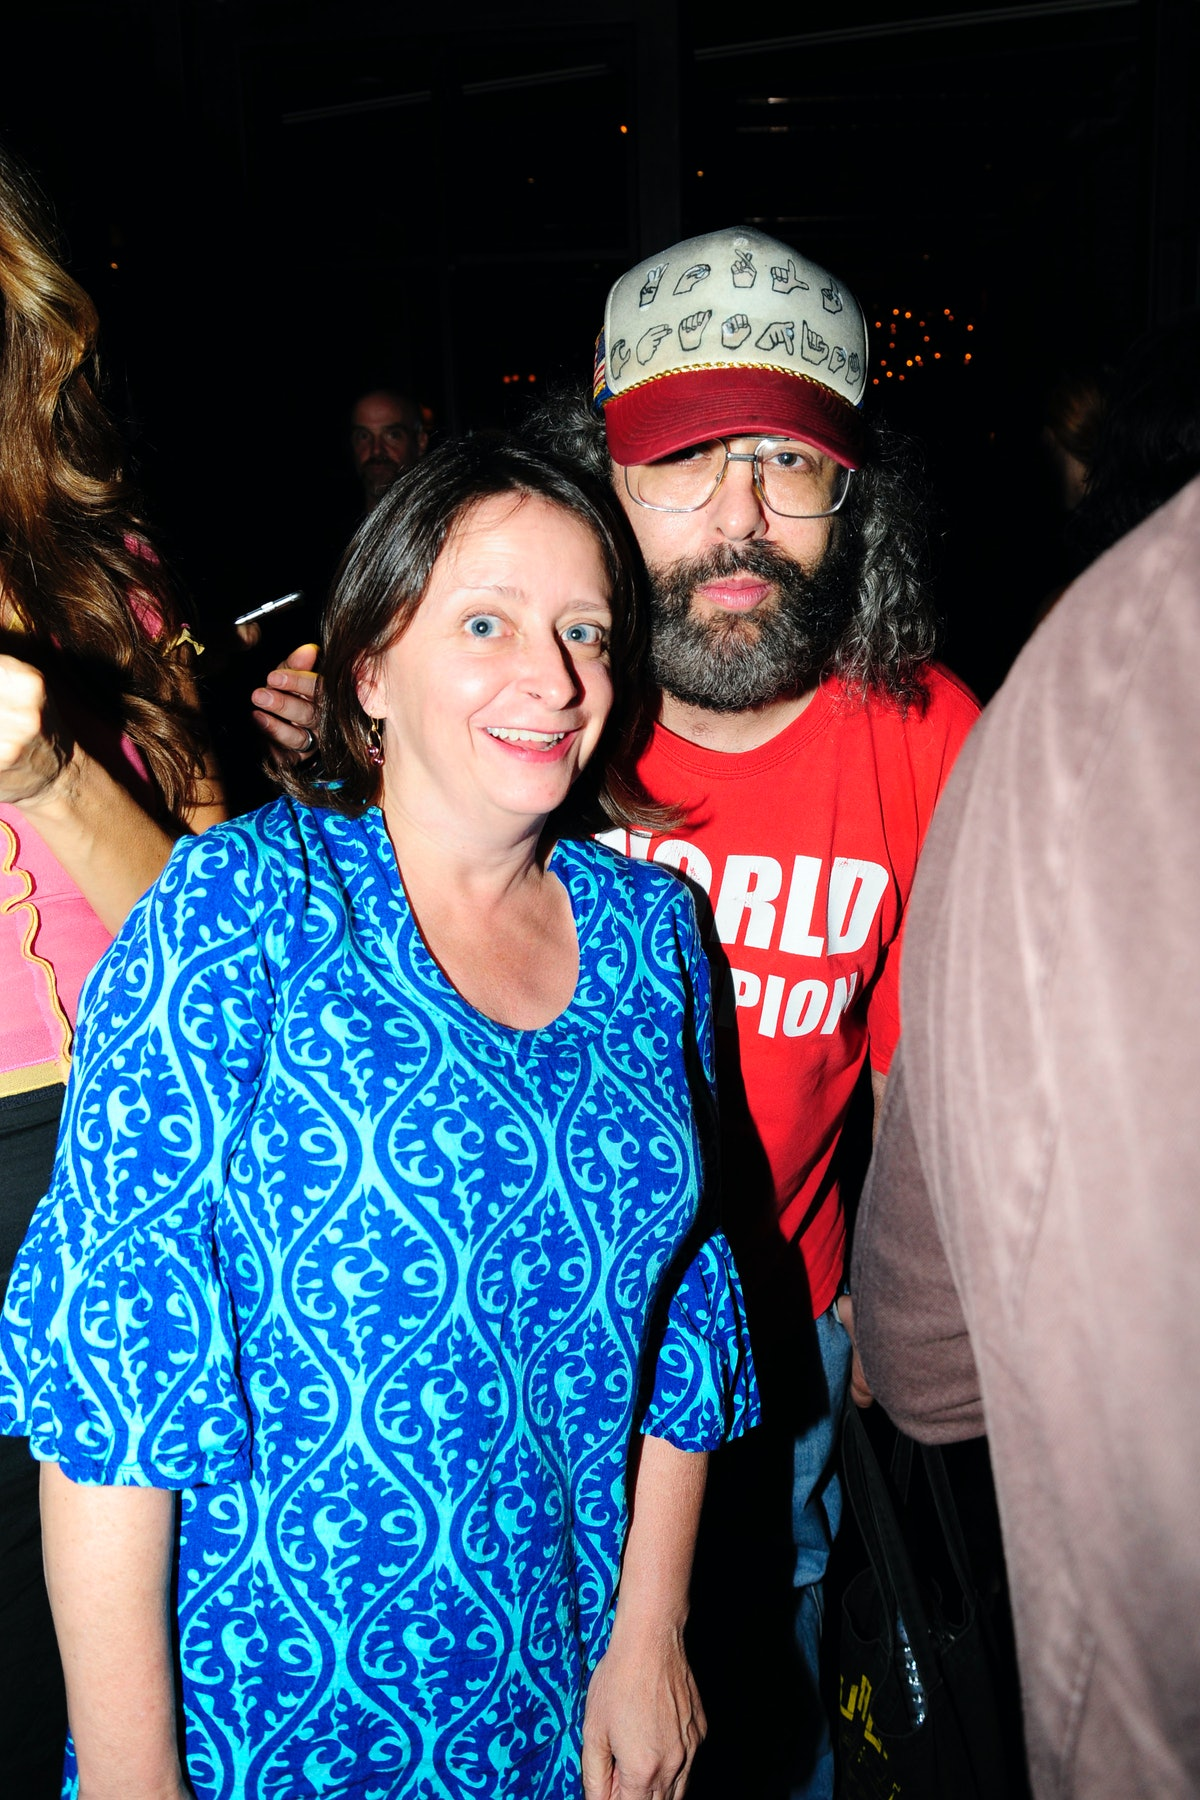 Rachel Dratch and Judah Friedlander